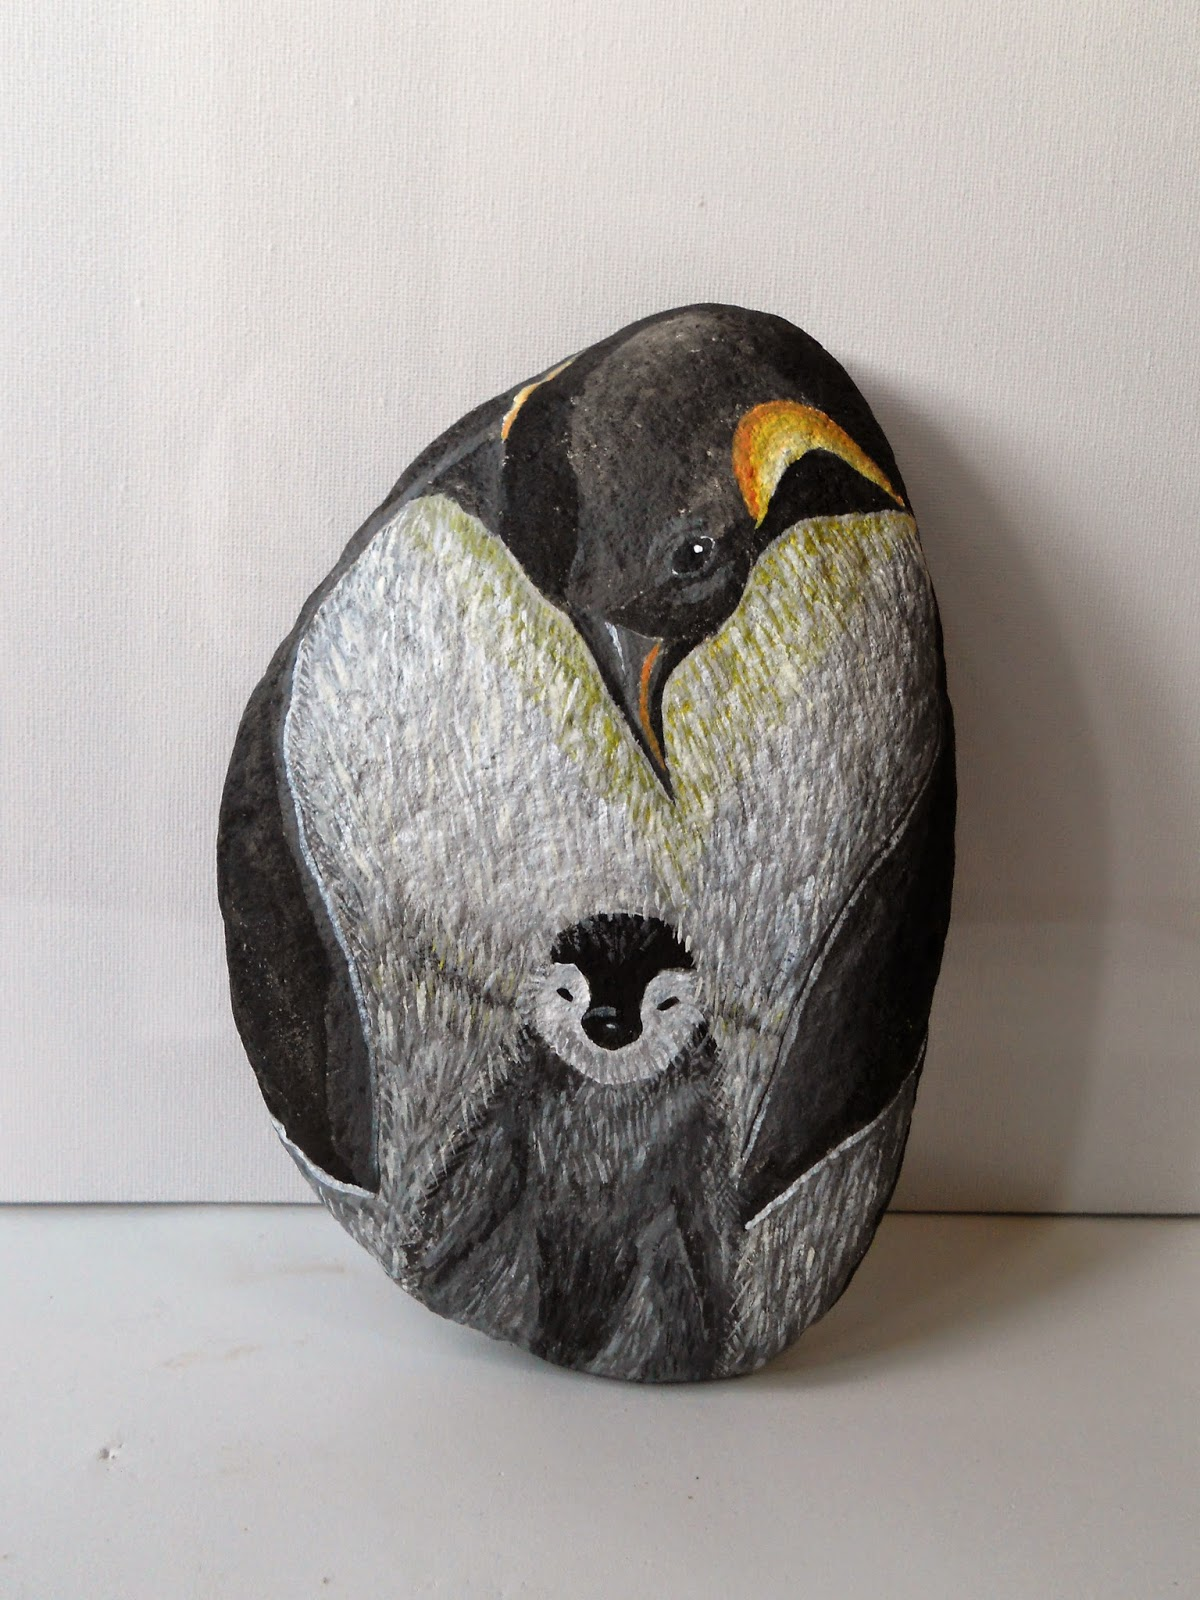 PIEDRAS PINTADAS A MANO: pinguino